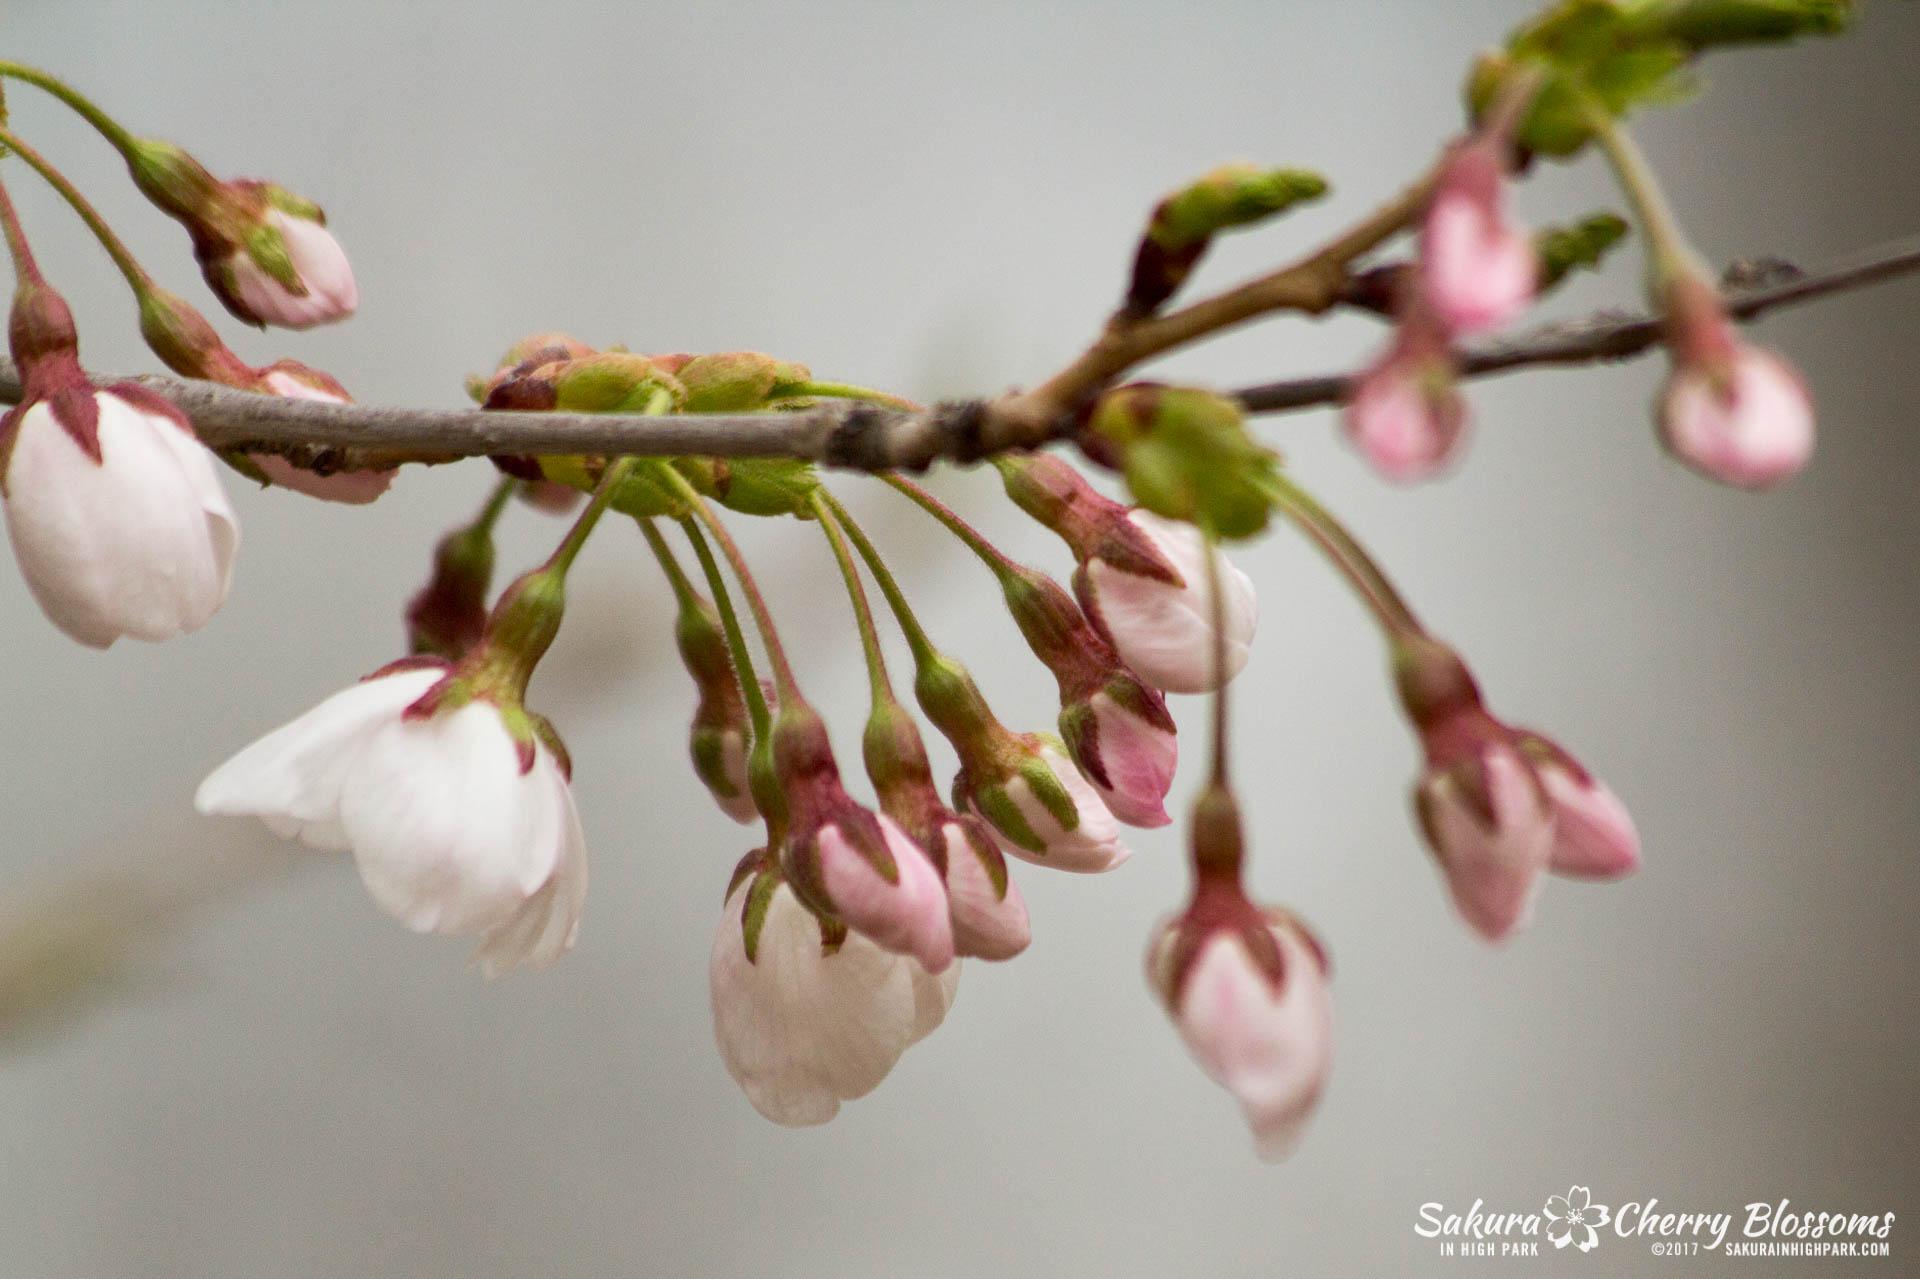 Sakura-Watch-April-21-2017-bloom-still-in-early-stages-66.jpg